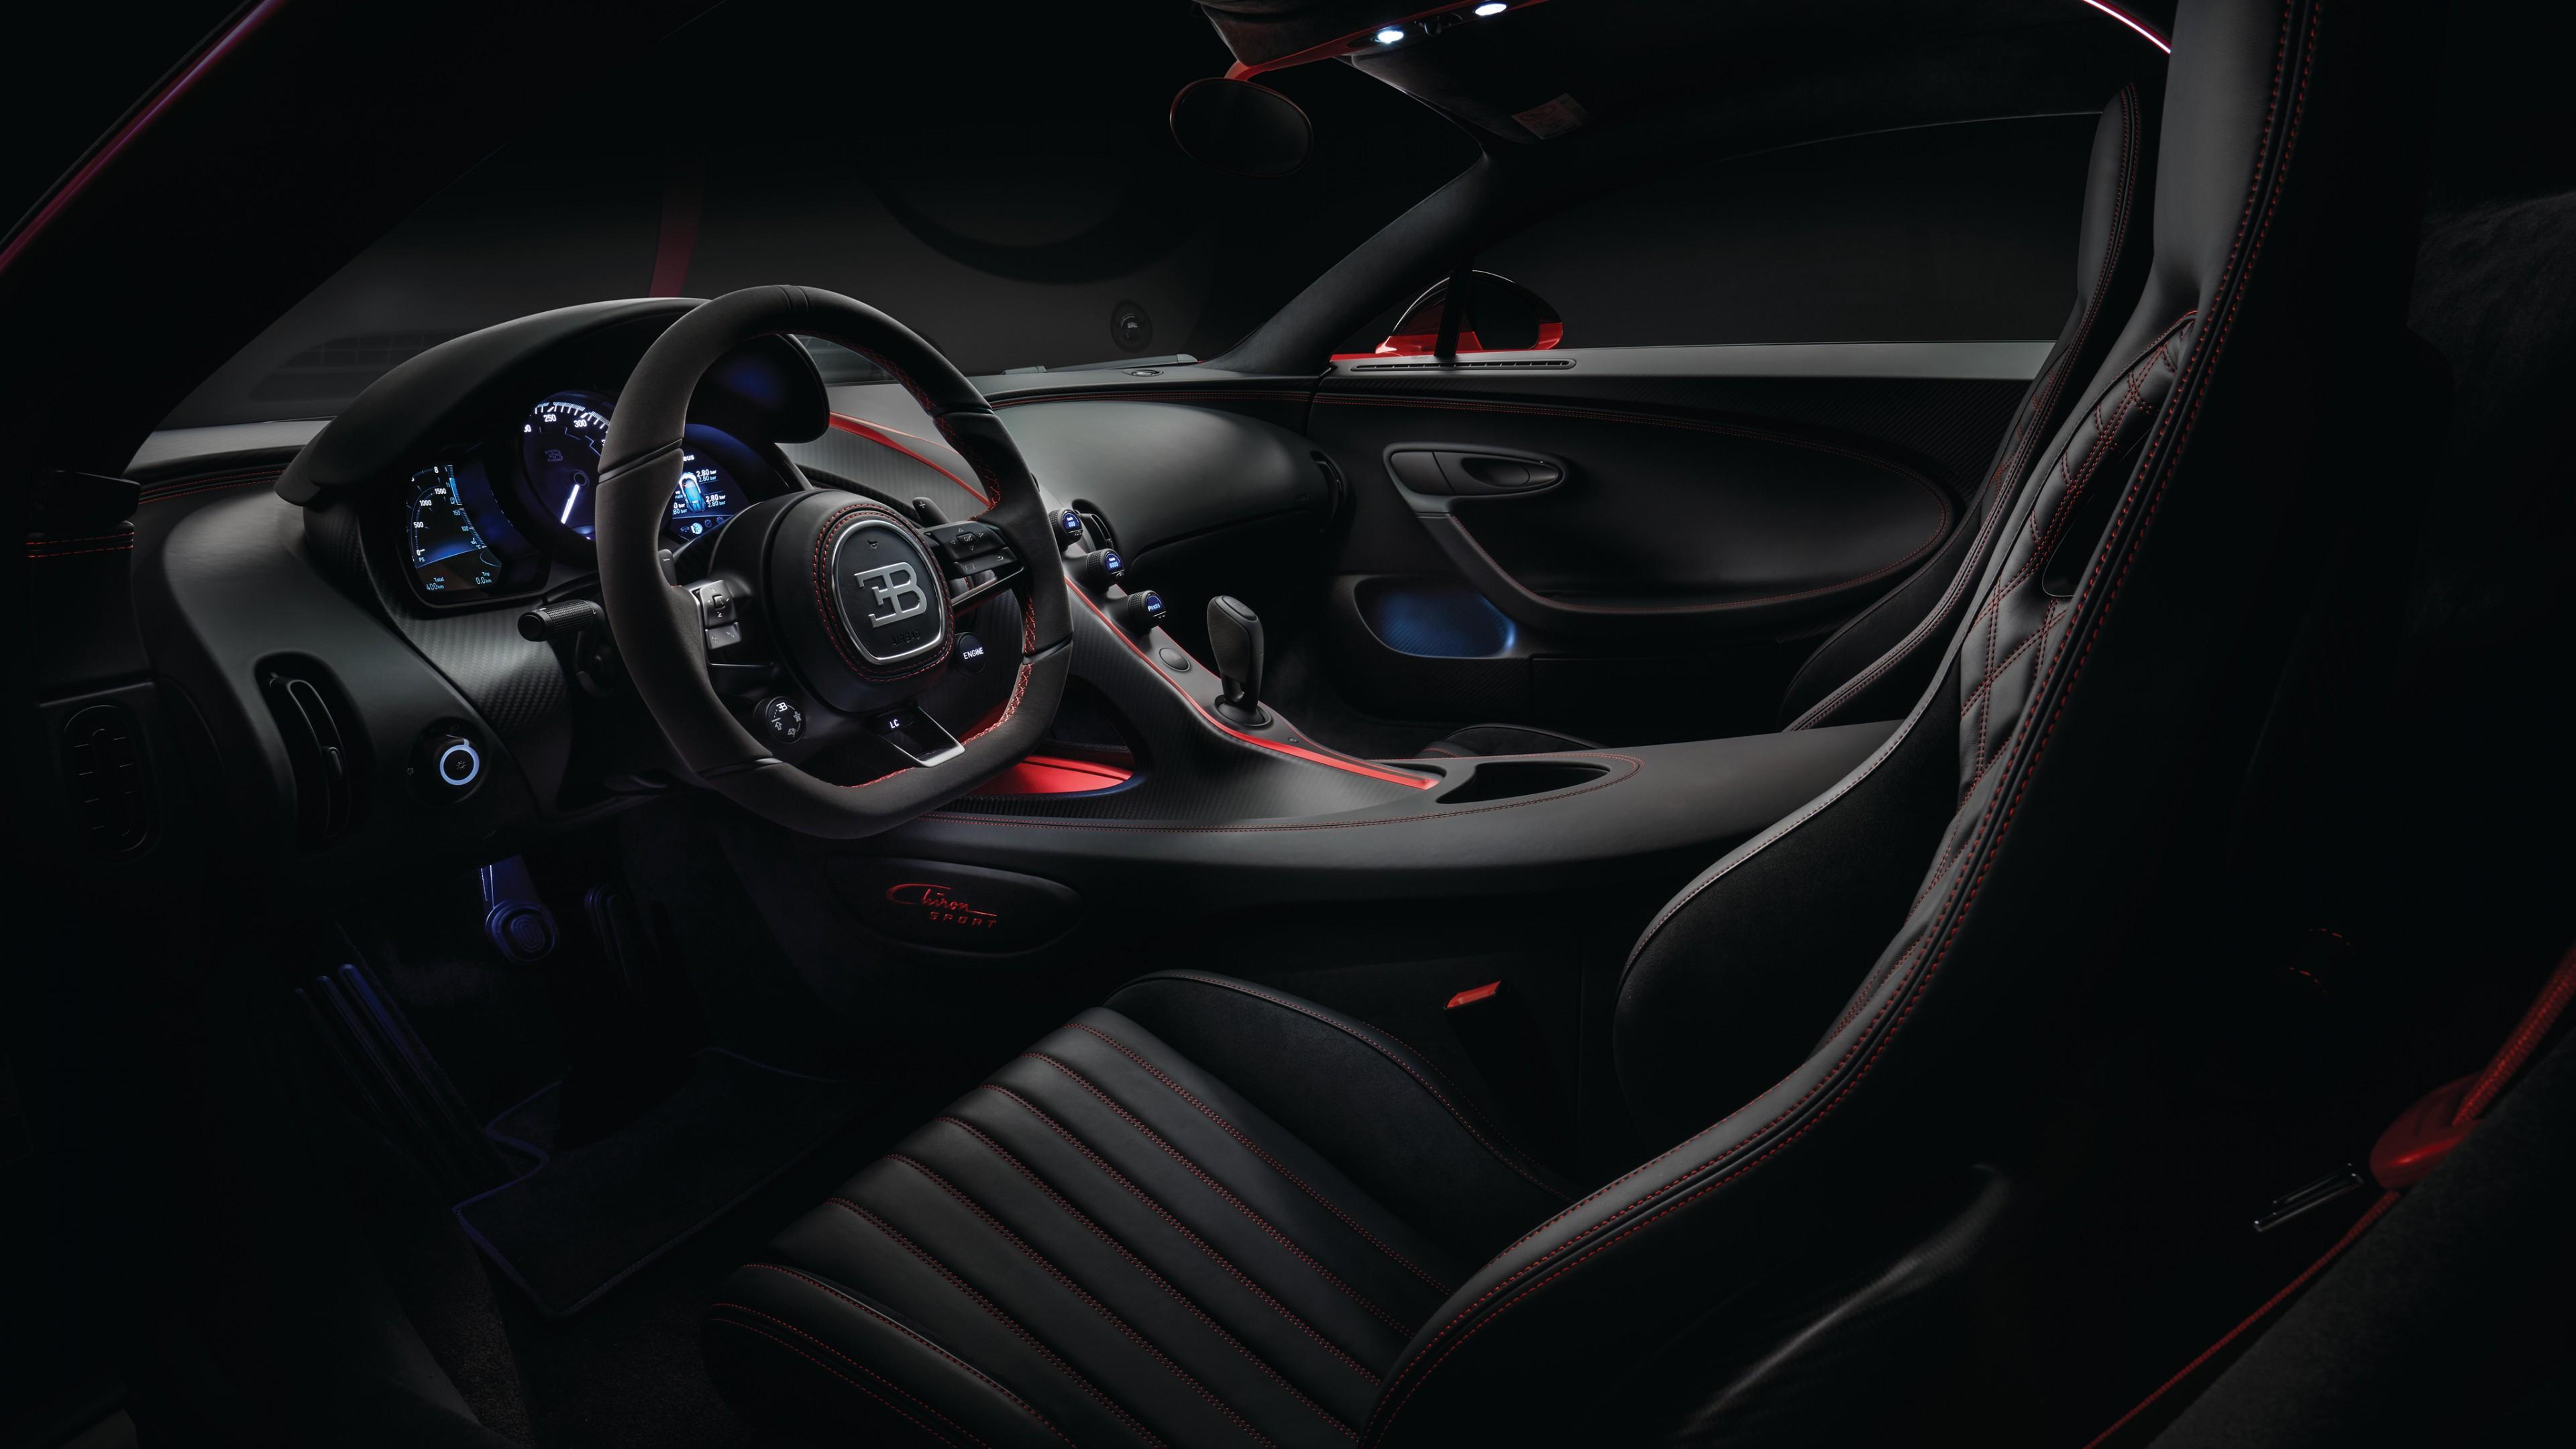 Bugatti Chiron Sport Iphone Wallpaper: 2018 Bugatti Chiron Sport 4K 5 Wallpaper